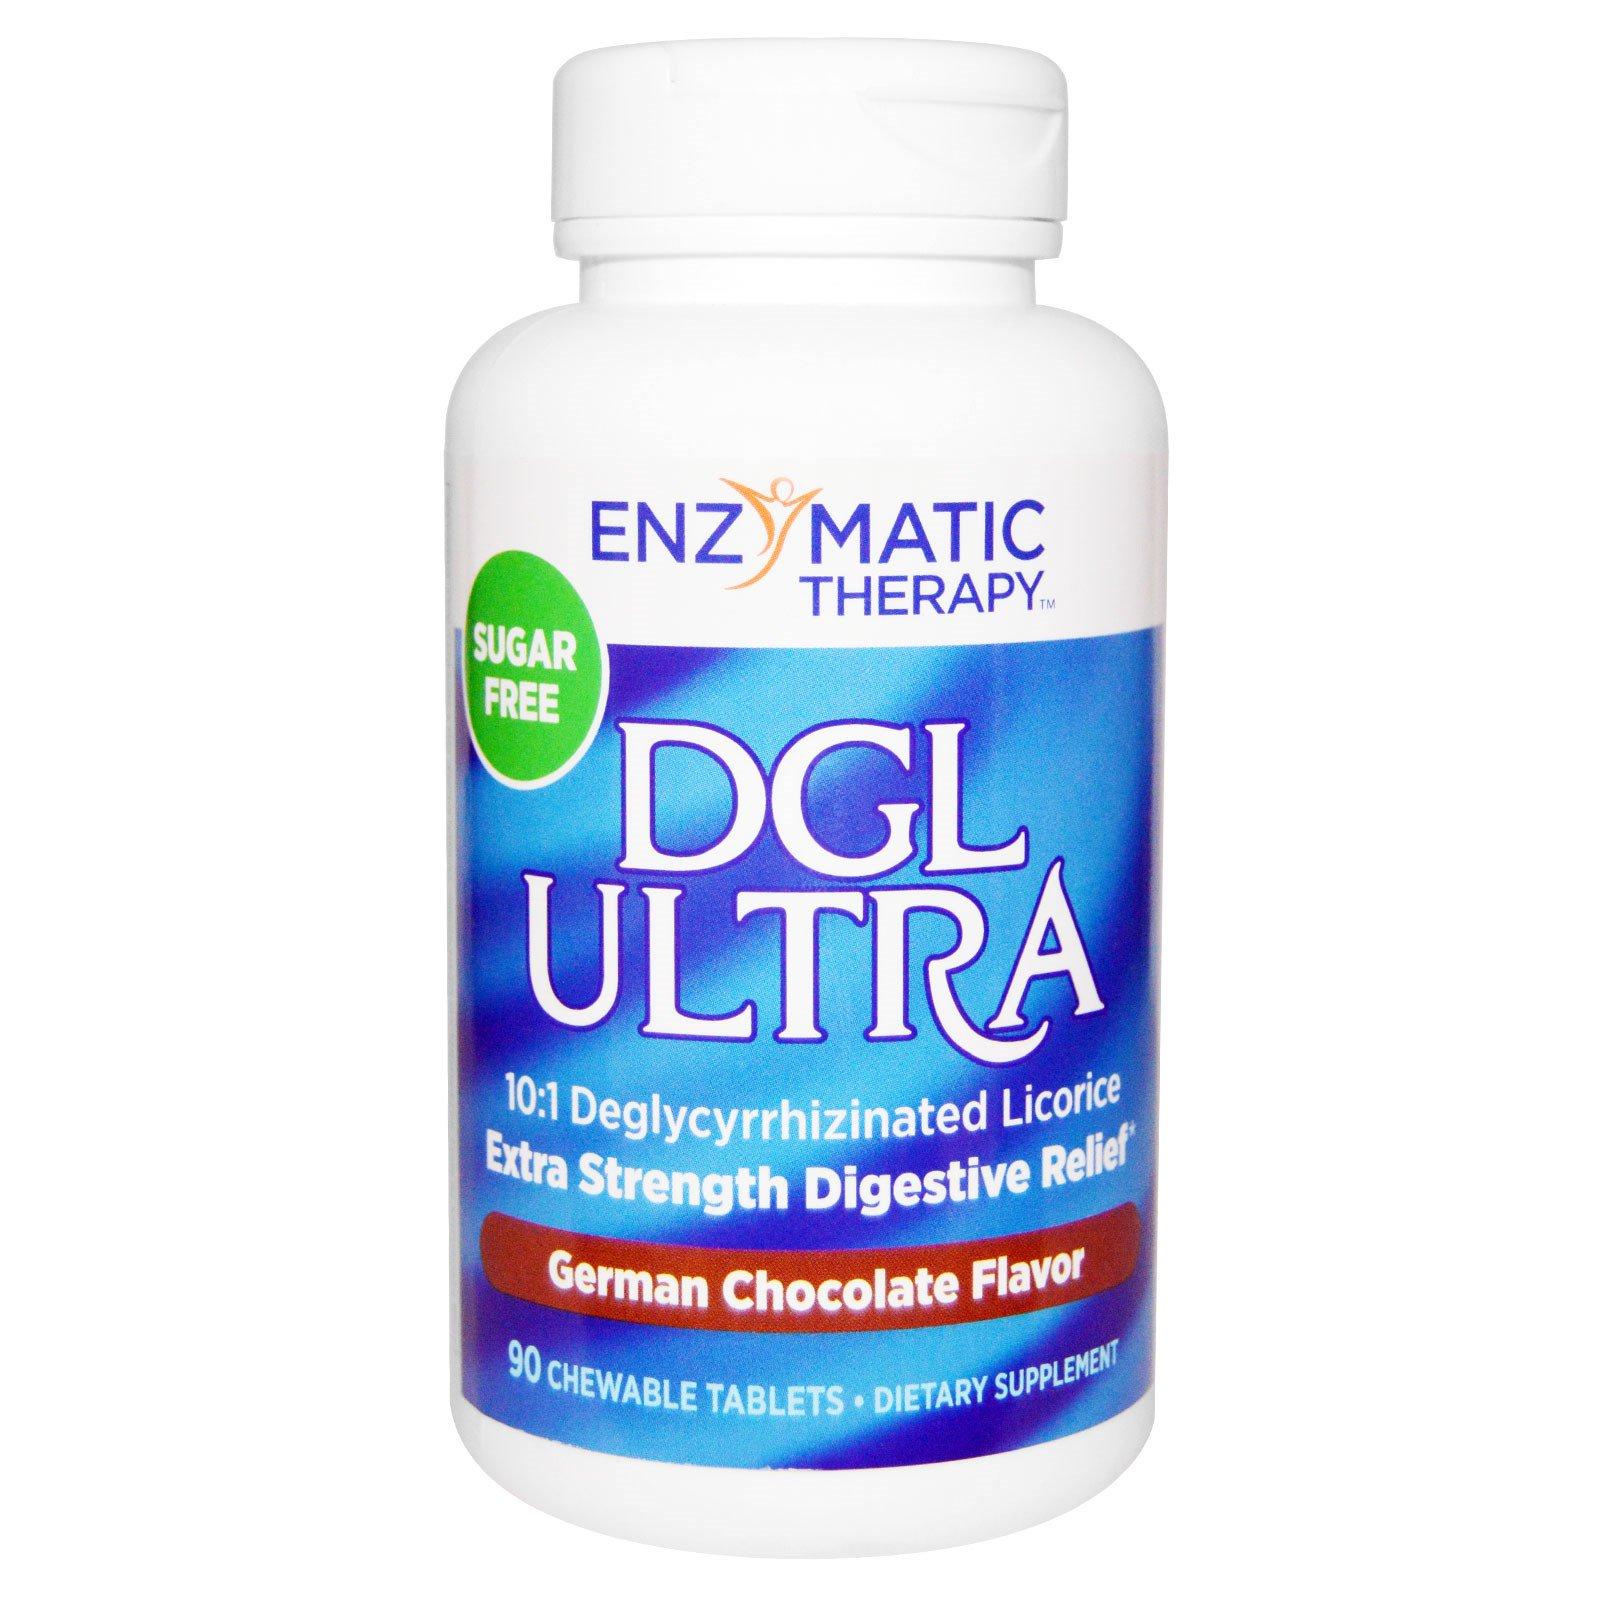 Enzymatic Therapy, DGL Ultra, без сахара, со вкусом немецкого шоколада, 90 жевательных таблеток